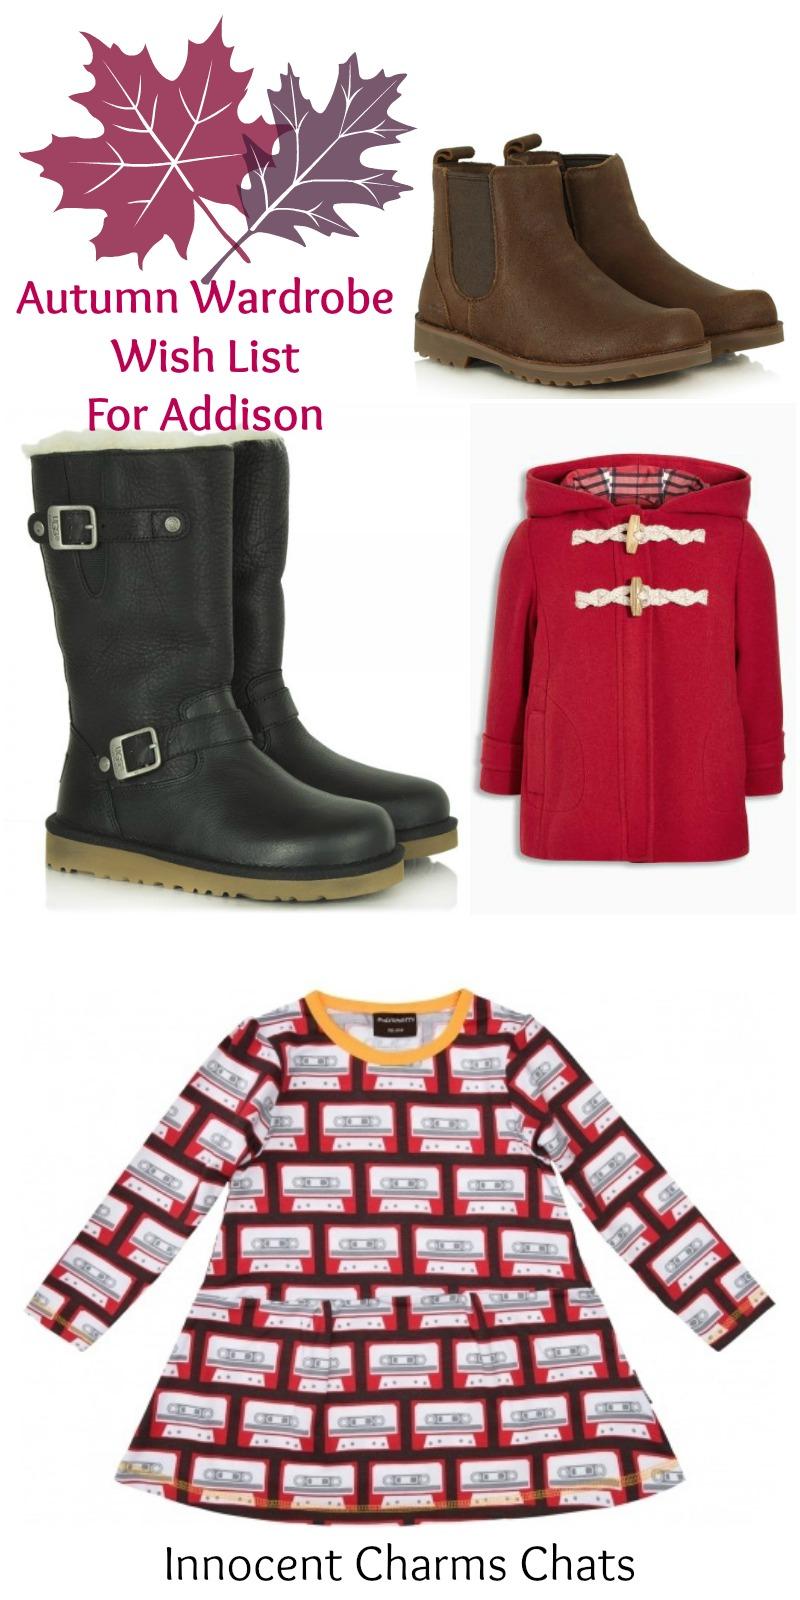 Autumn Wardrobe Wish List